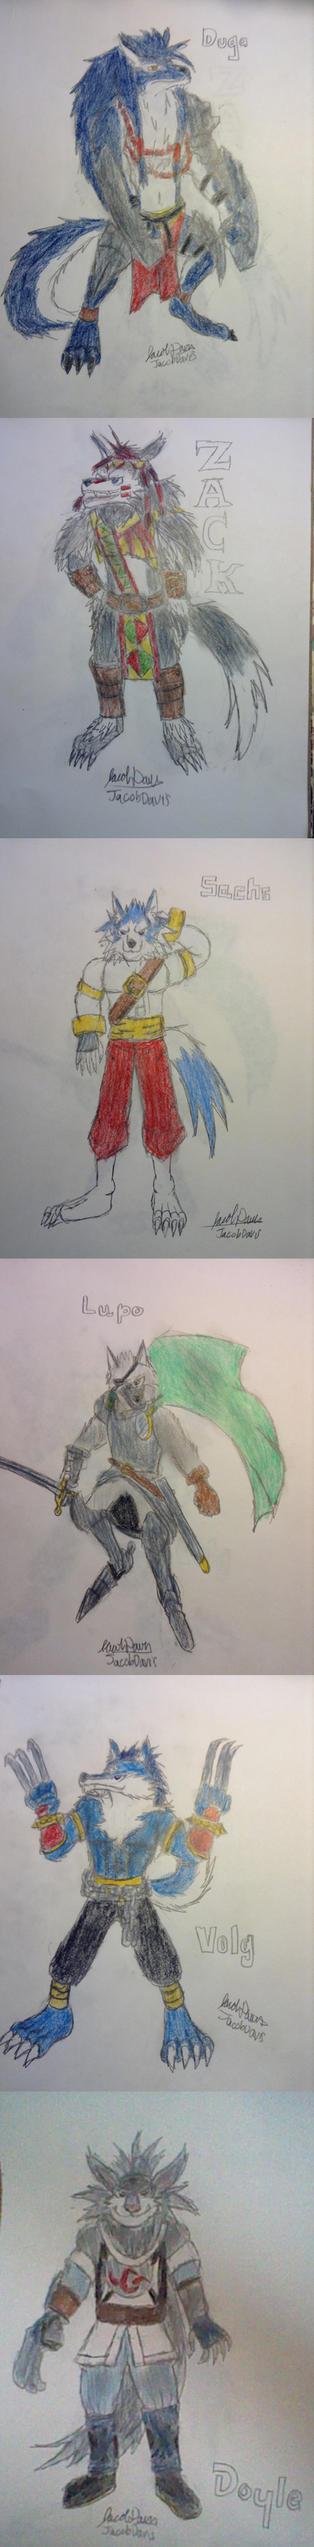 Wolflings by jacobspencer04